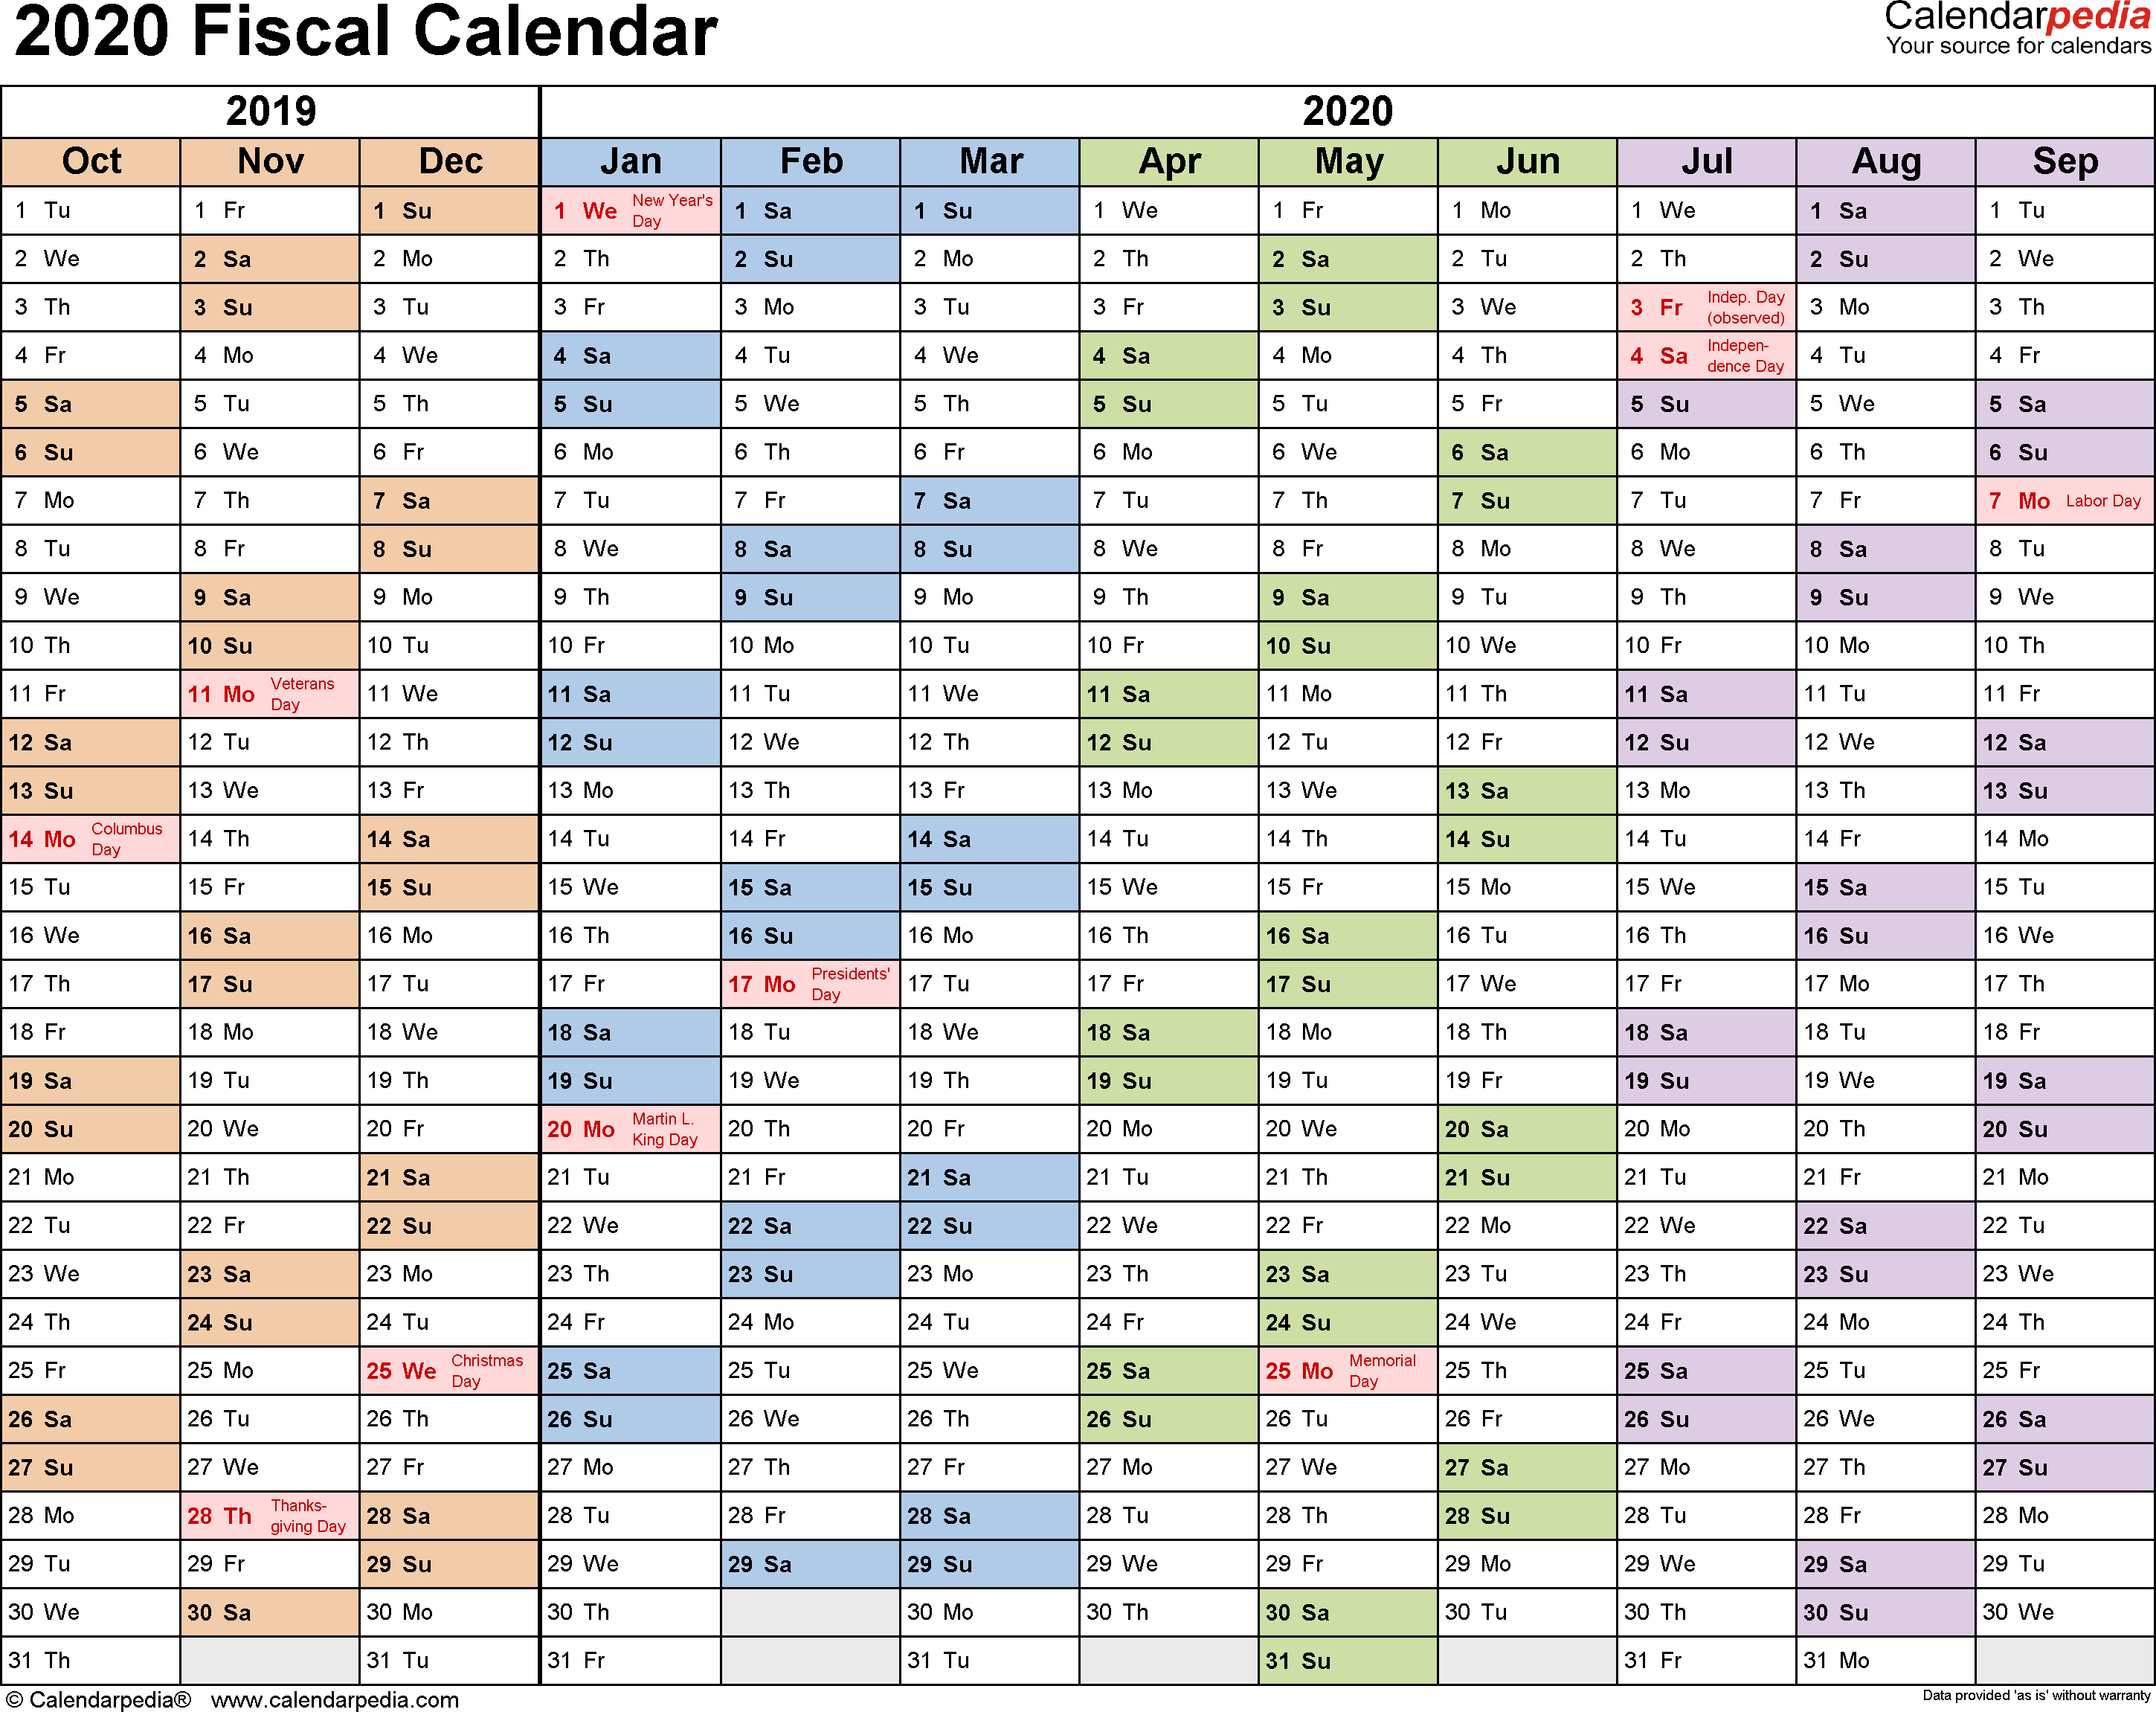 2020 Fiscal Year Calendar - Wpa.wpart.co